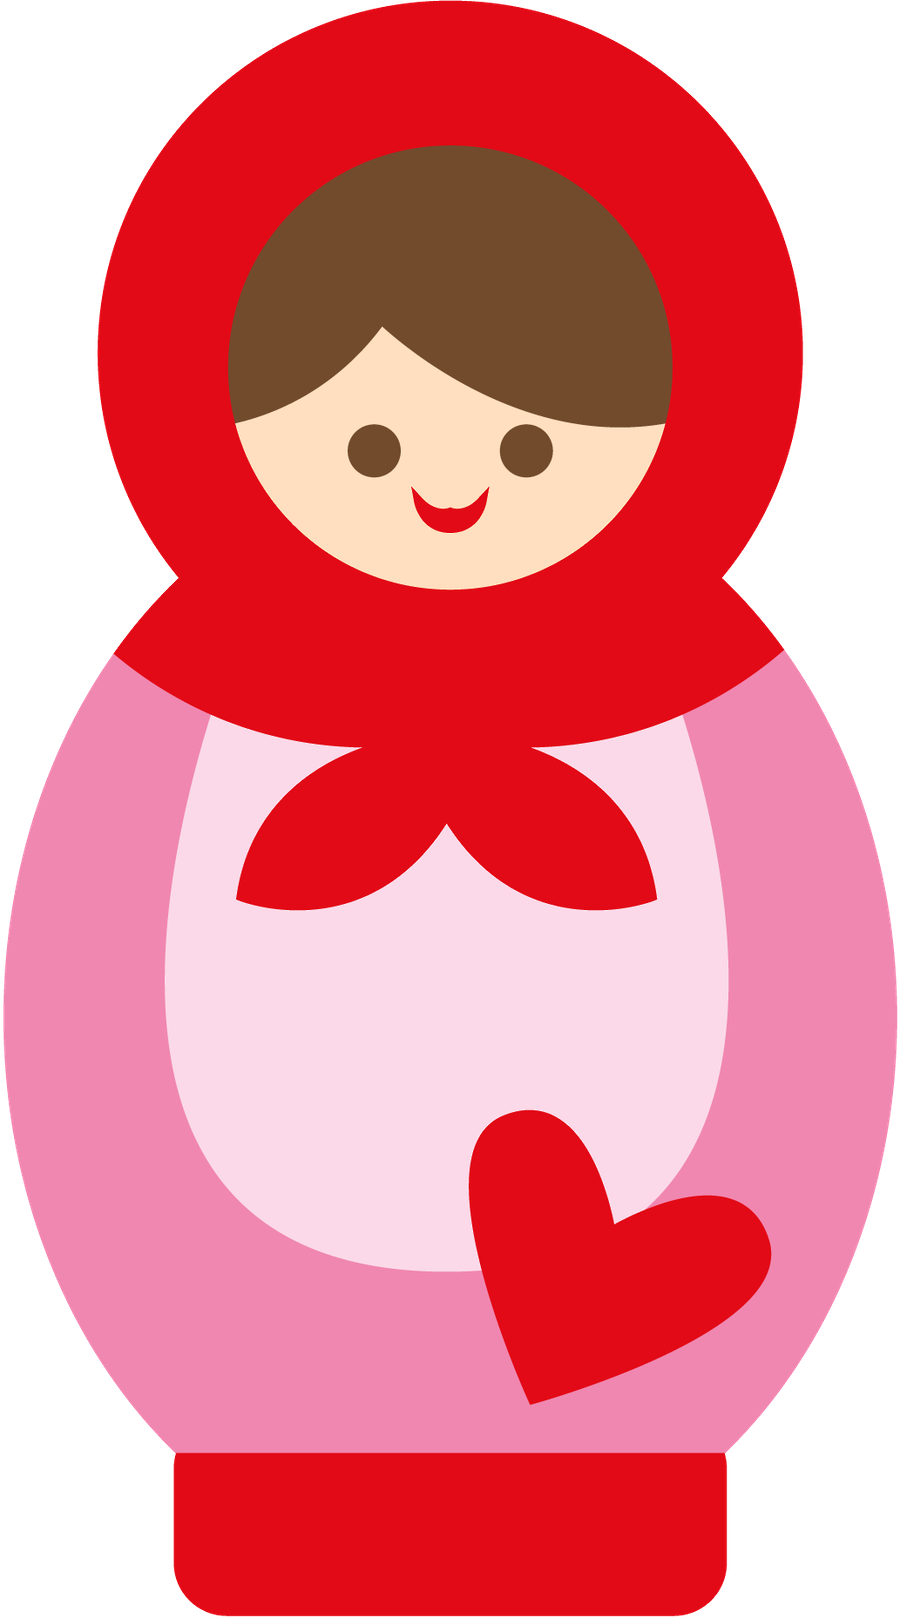 Minus say hello matrioska. Dolls clipart sewing group